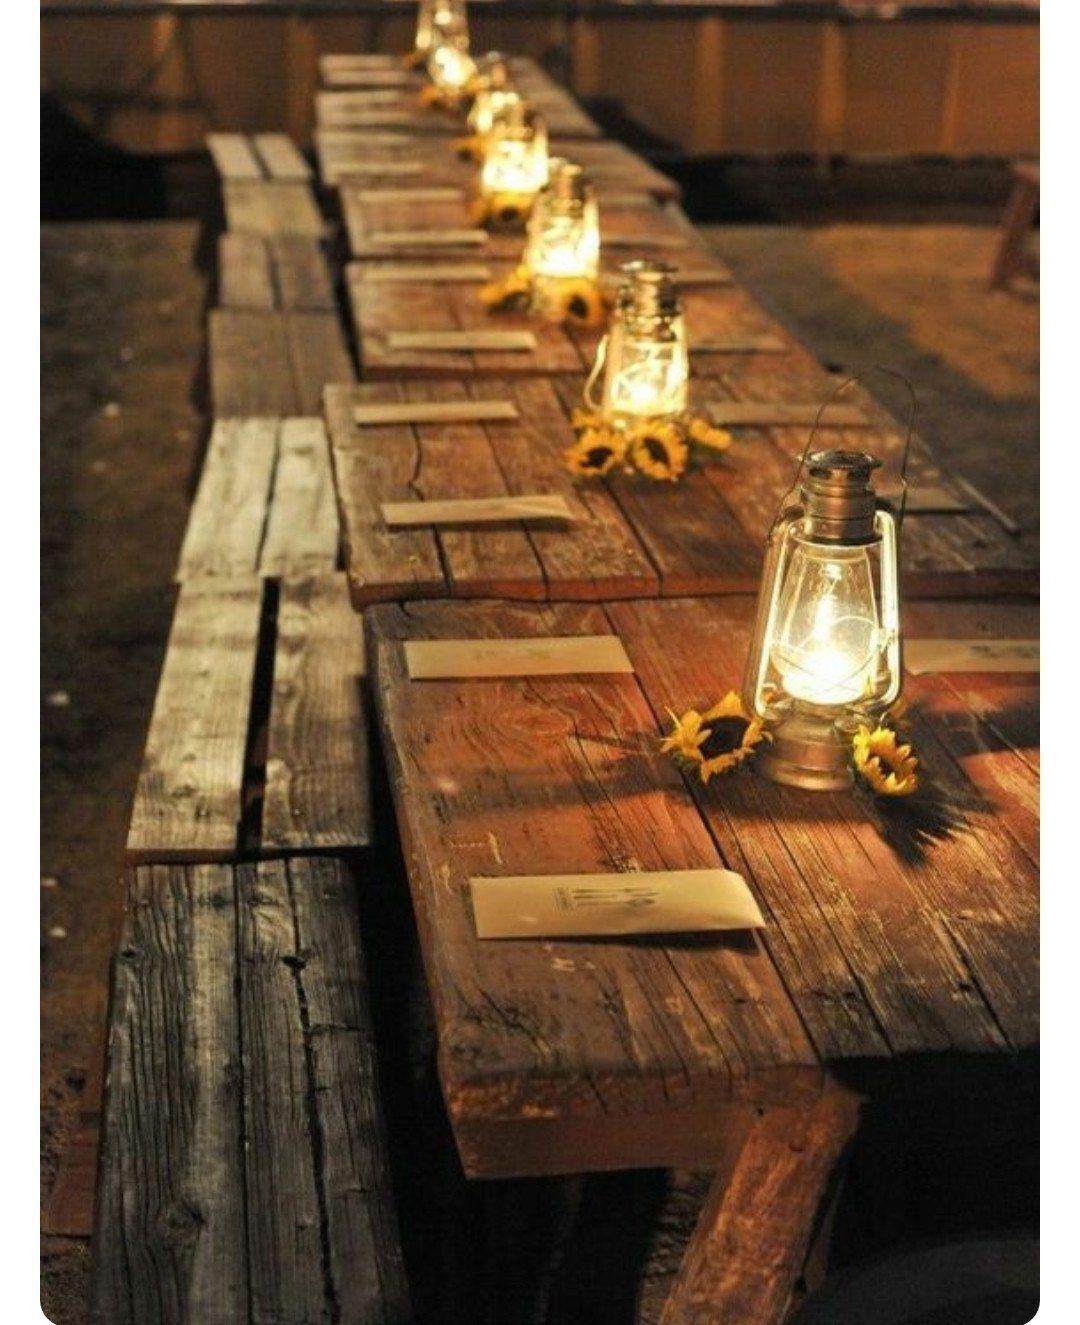 Barn wedding table settings  Bench Reclaimed Barn wood  Pinterest  Barn wood Wedding planning